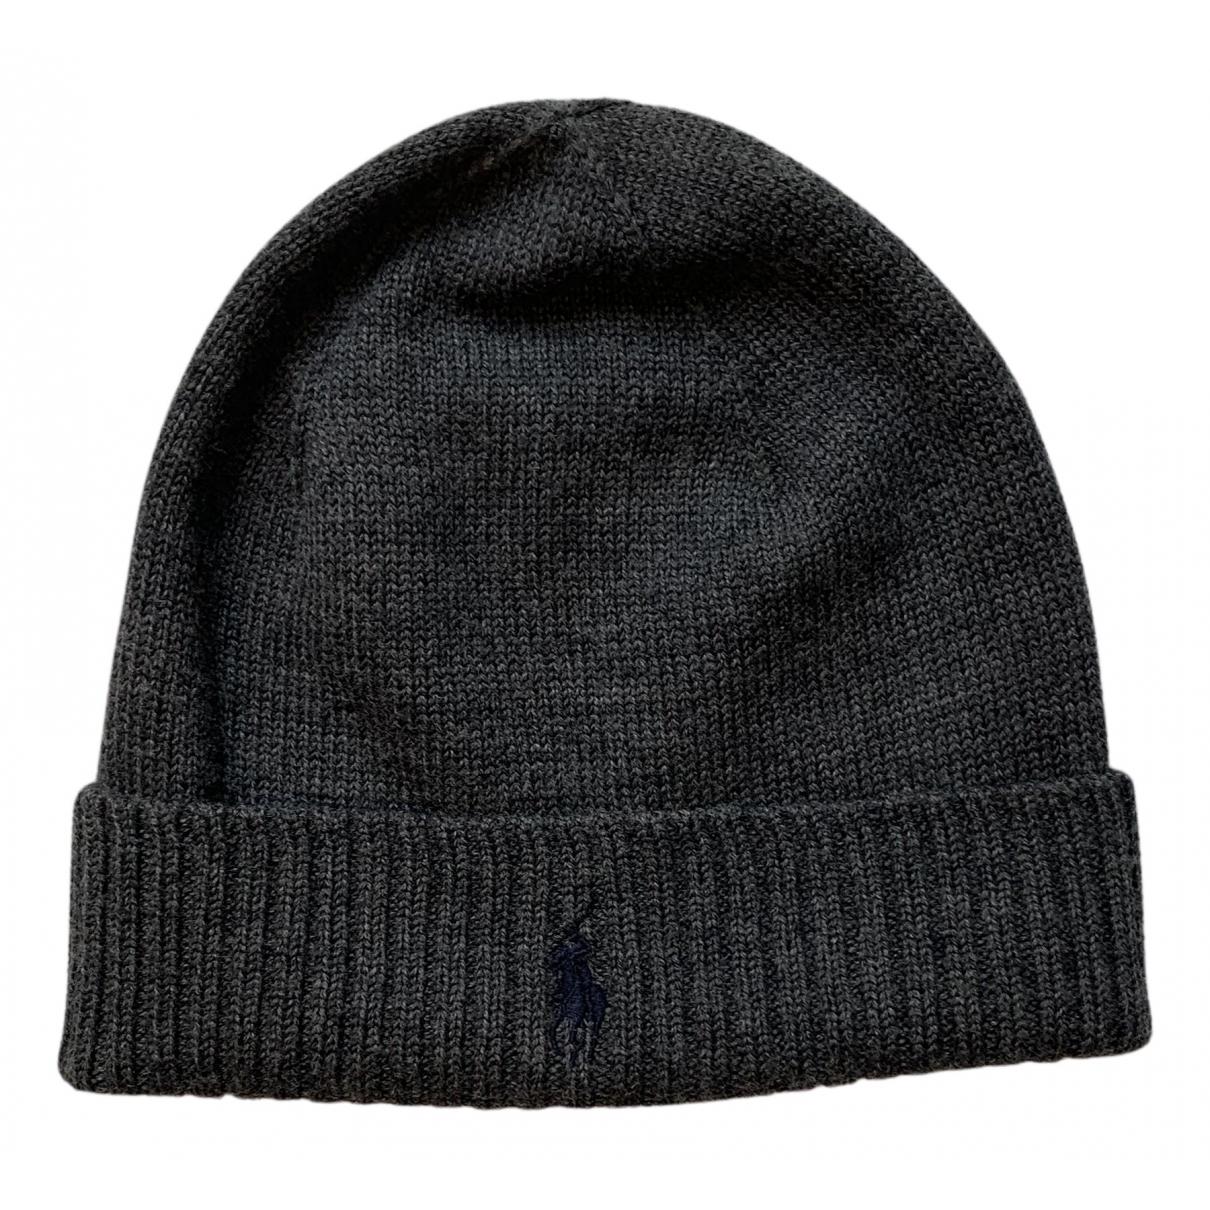 Polo Ralph Lauren N Grey Wool hat & pull on hat for Men L International